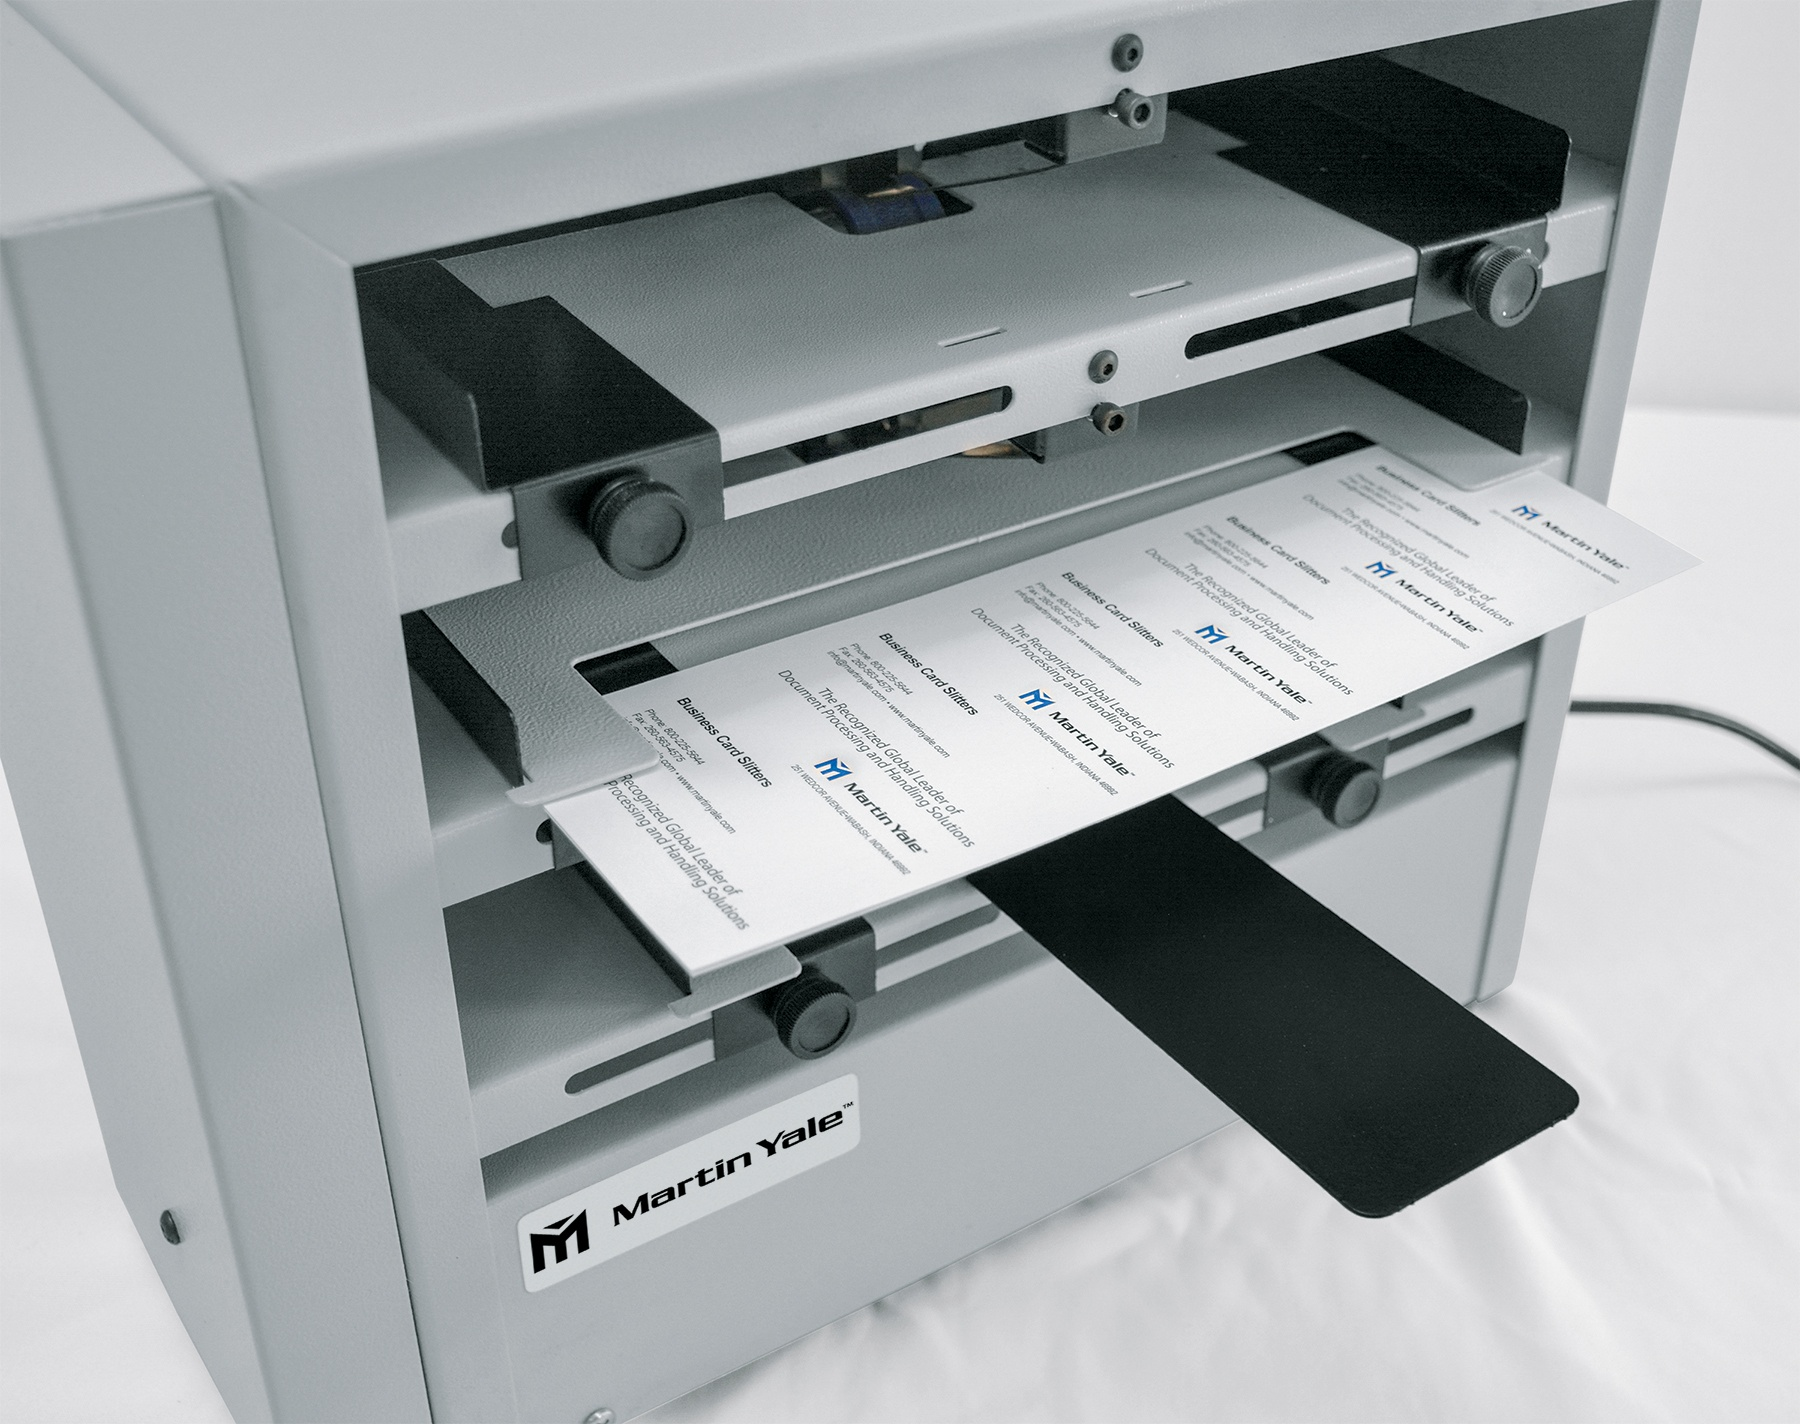 BCS410 Desktop Business Card Slitter/Score/Perforate - Martin Yale